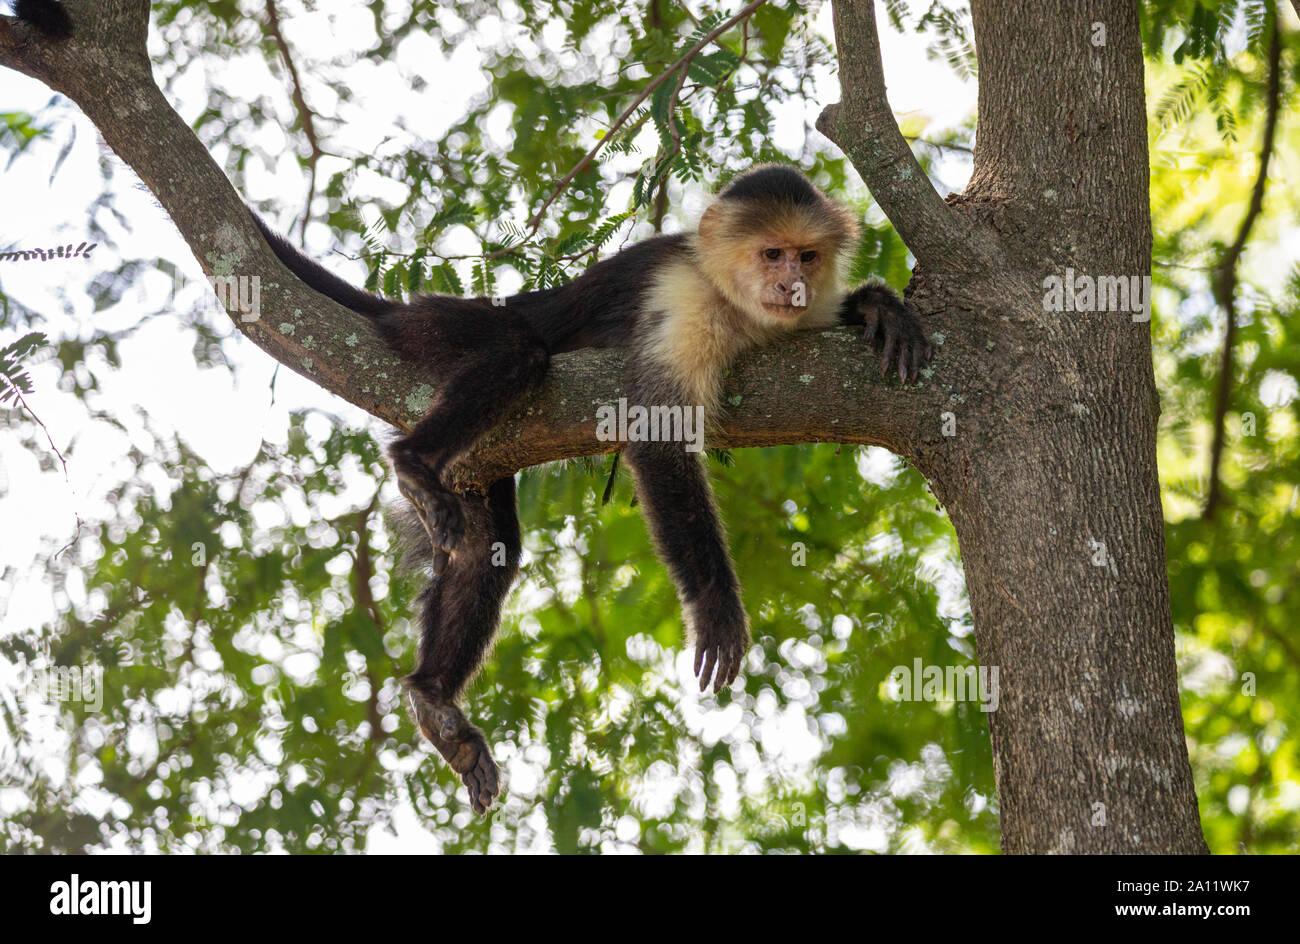 White-faced capuchin (Cebus imitator) near the RIU Palace Hotel in Guanacaste, Costa Rica Stock Photo